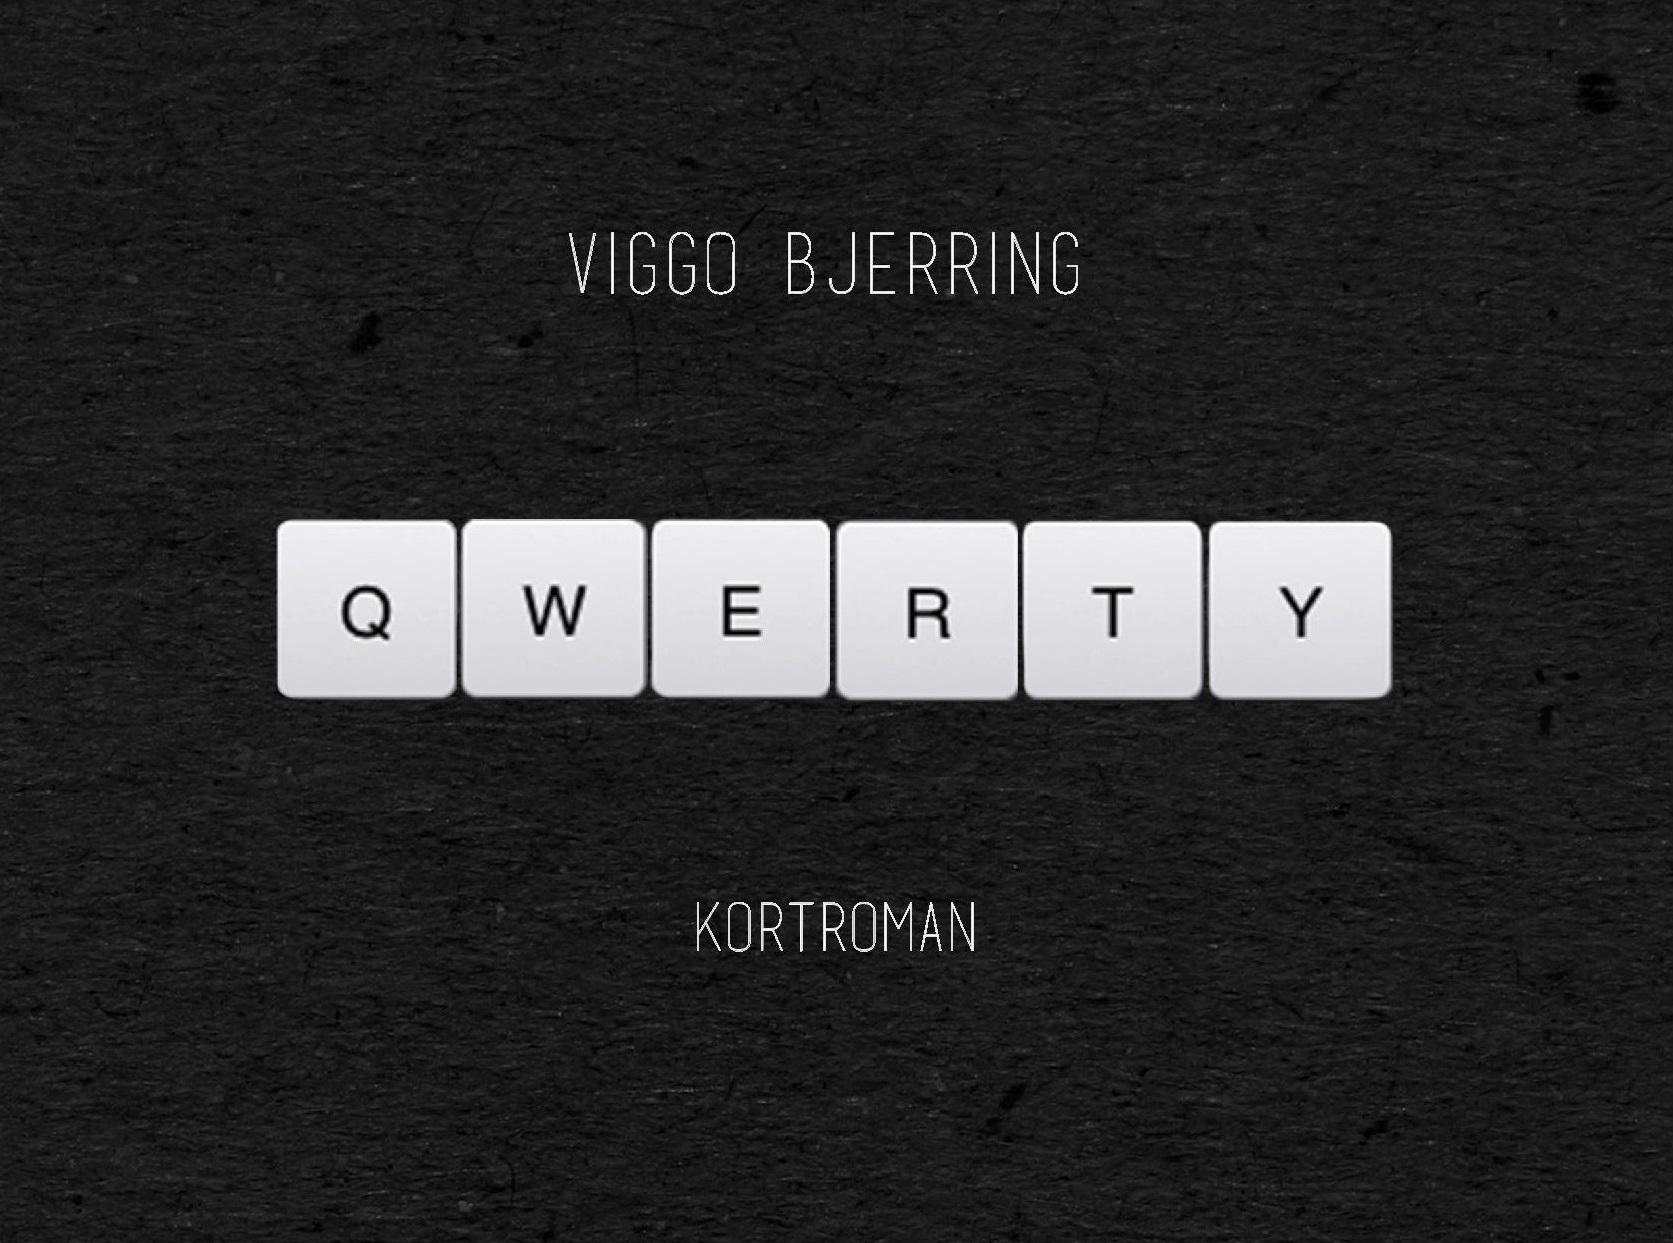 Viggo Bjerring, qwerty